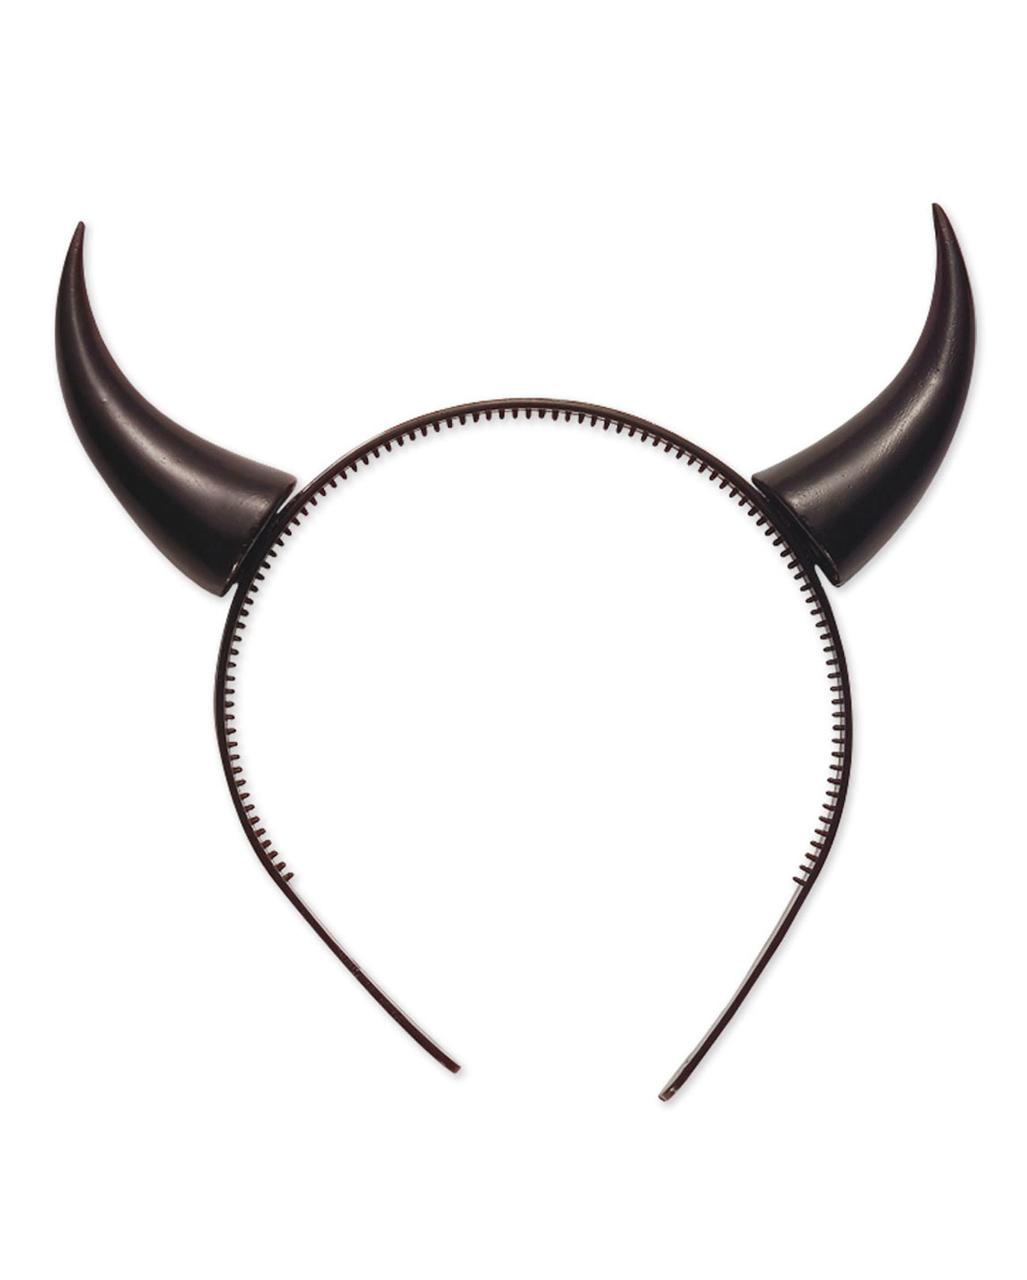 Teufel Hörner Teufelshörner schwarz Teufelin Kopfschmuck Halloween Kostüm Devil